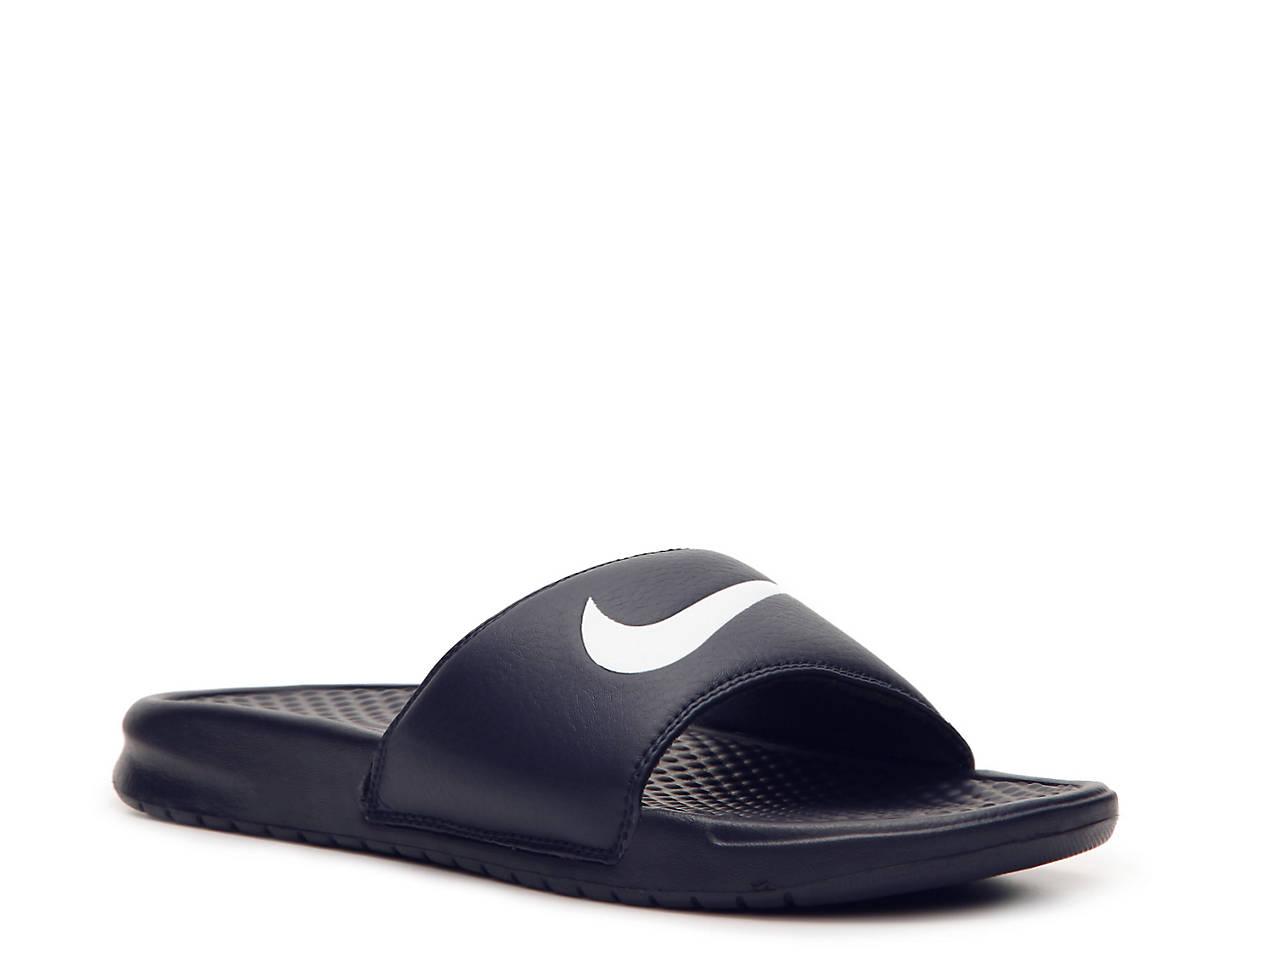 db79444a29a1 Nike Benassi Swoosh Slide Sandal - Men s Men s Shoes